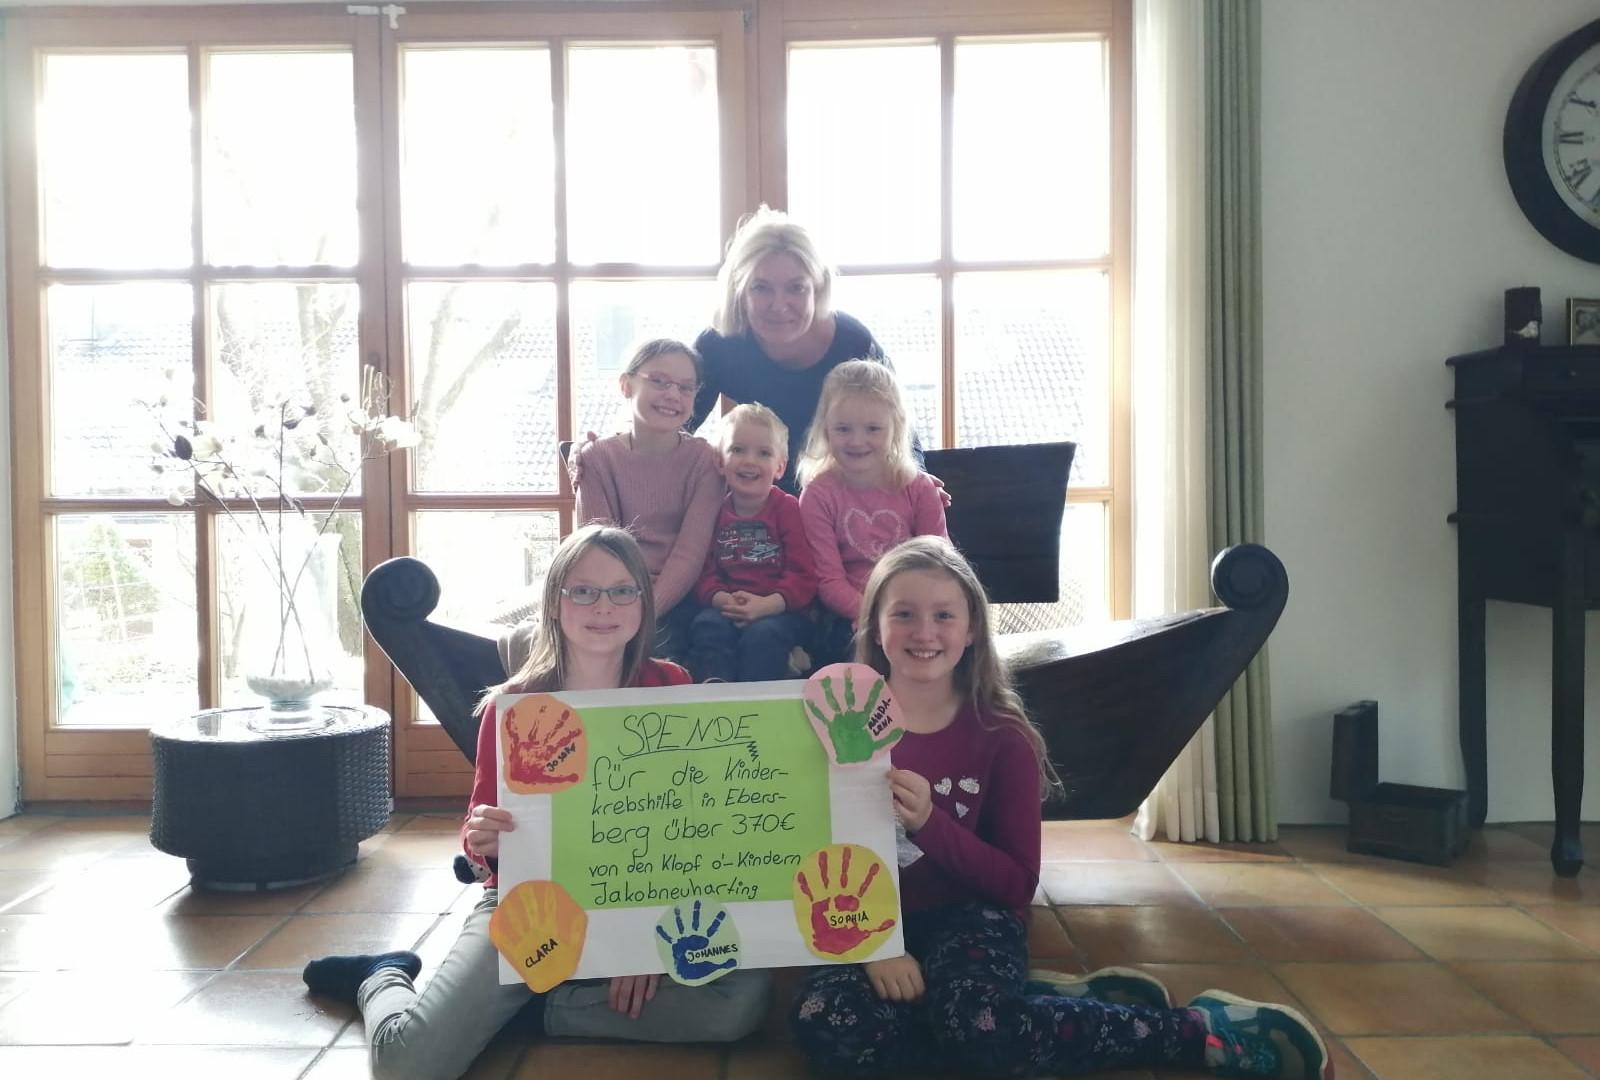 Klopf o´- Kinder aus Jakobneuharting sammeln tolle 370 € für die Kinderkrebshilfe Ebersberg e.V.